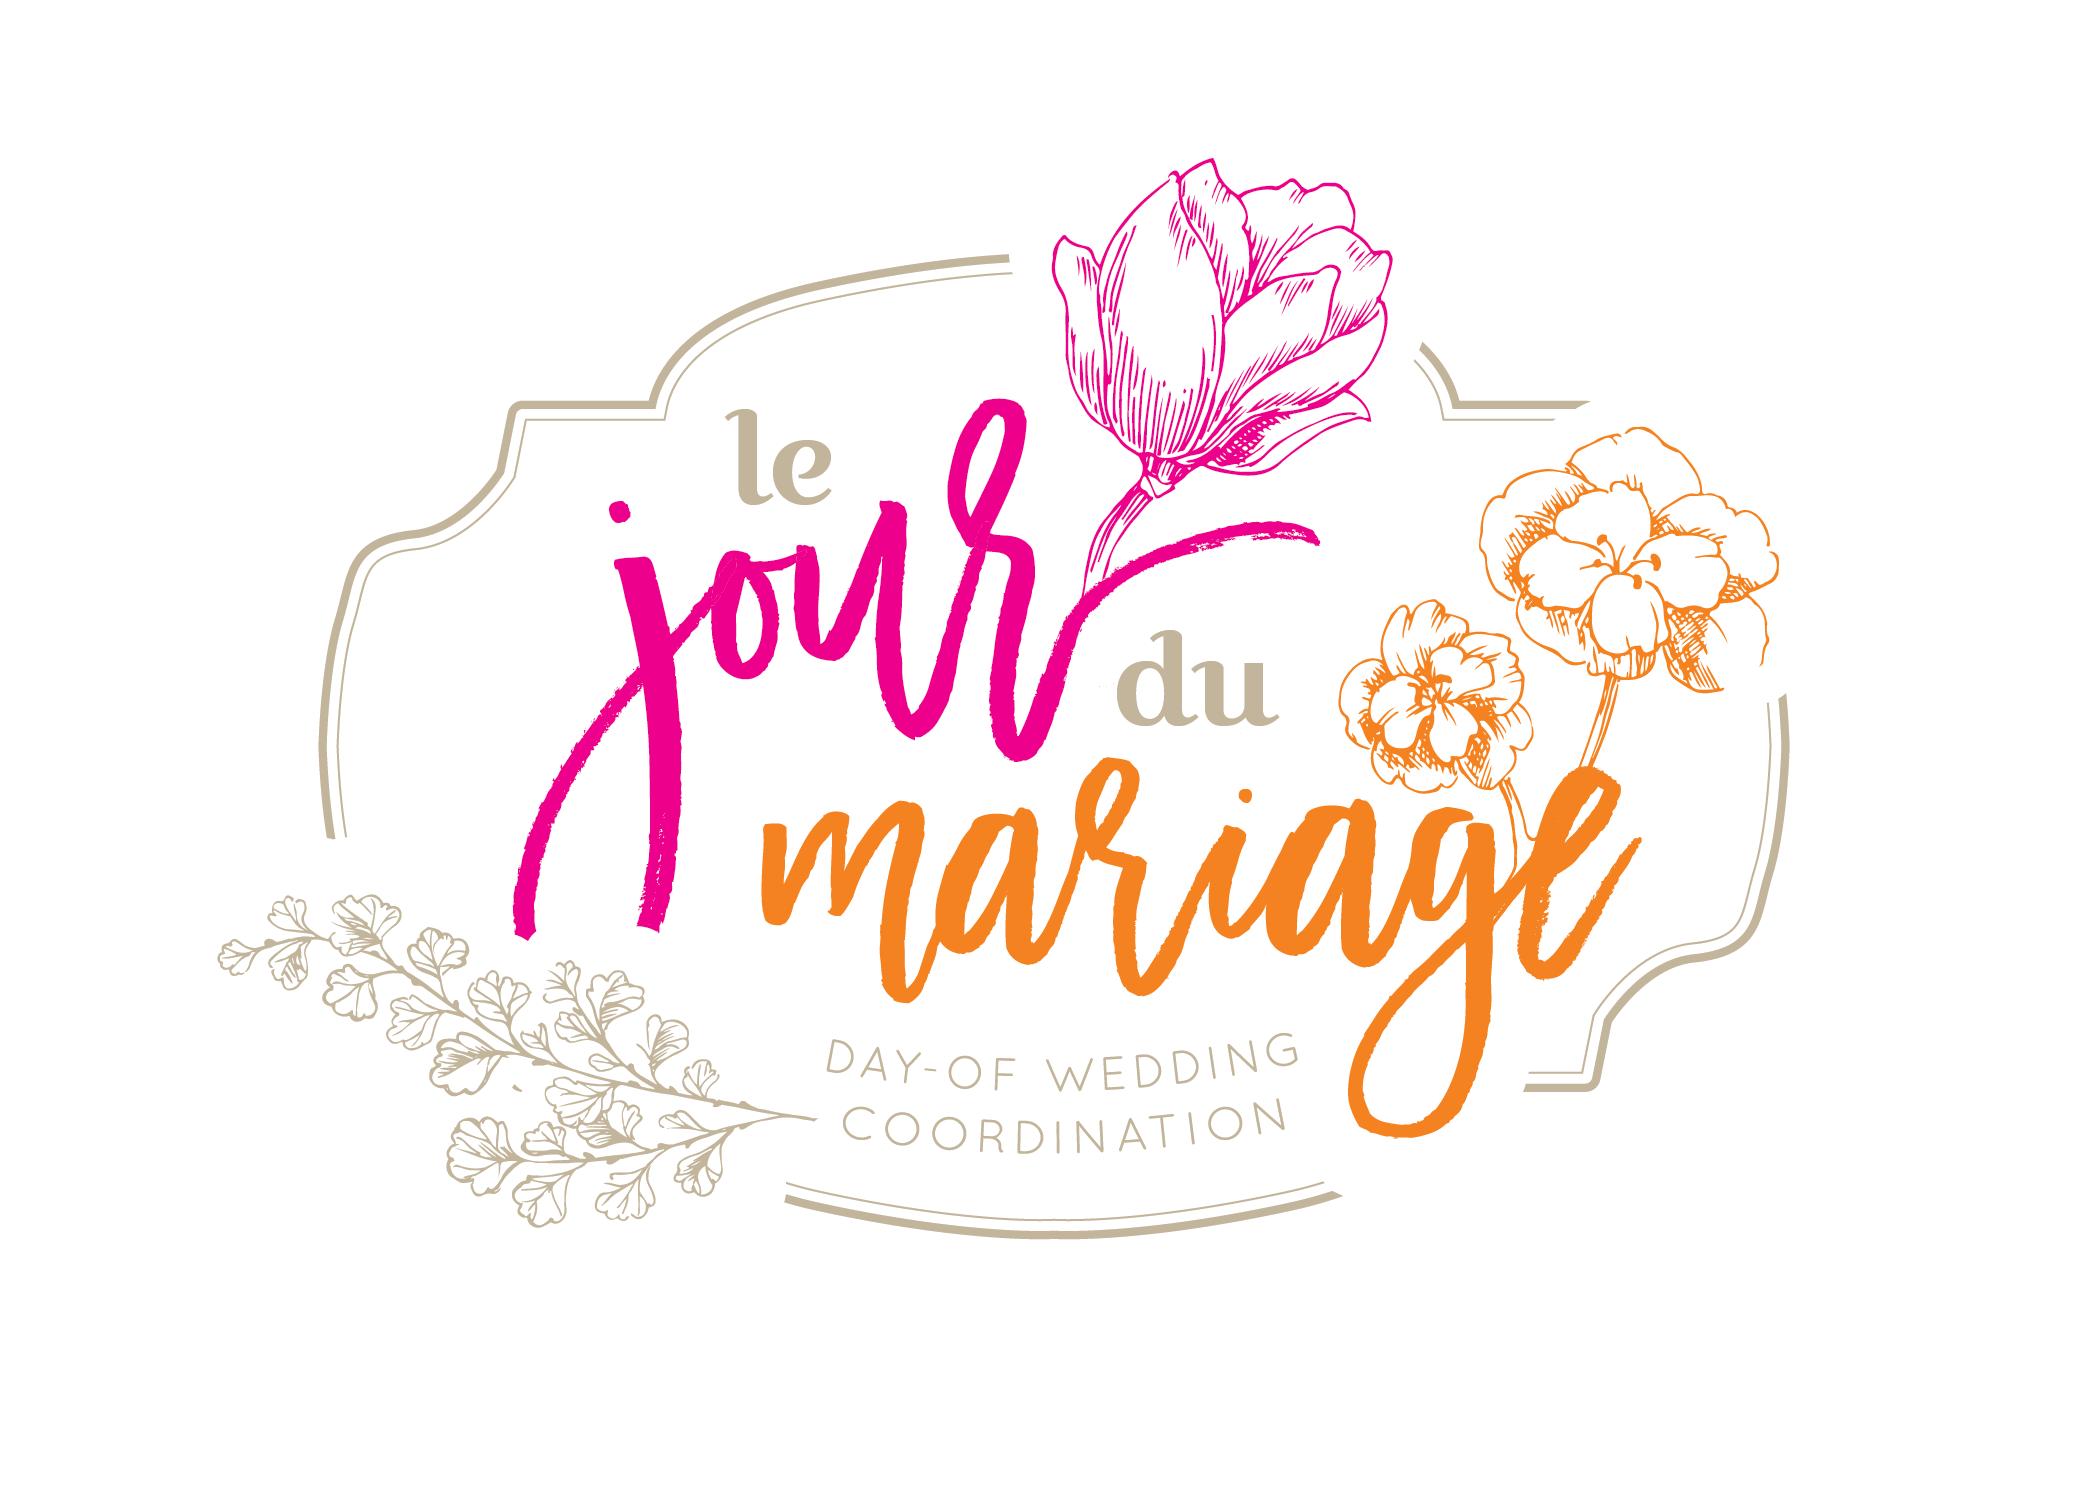 LeJourDuMariage_logo-01